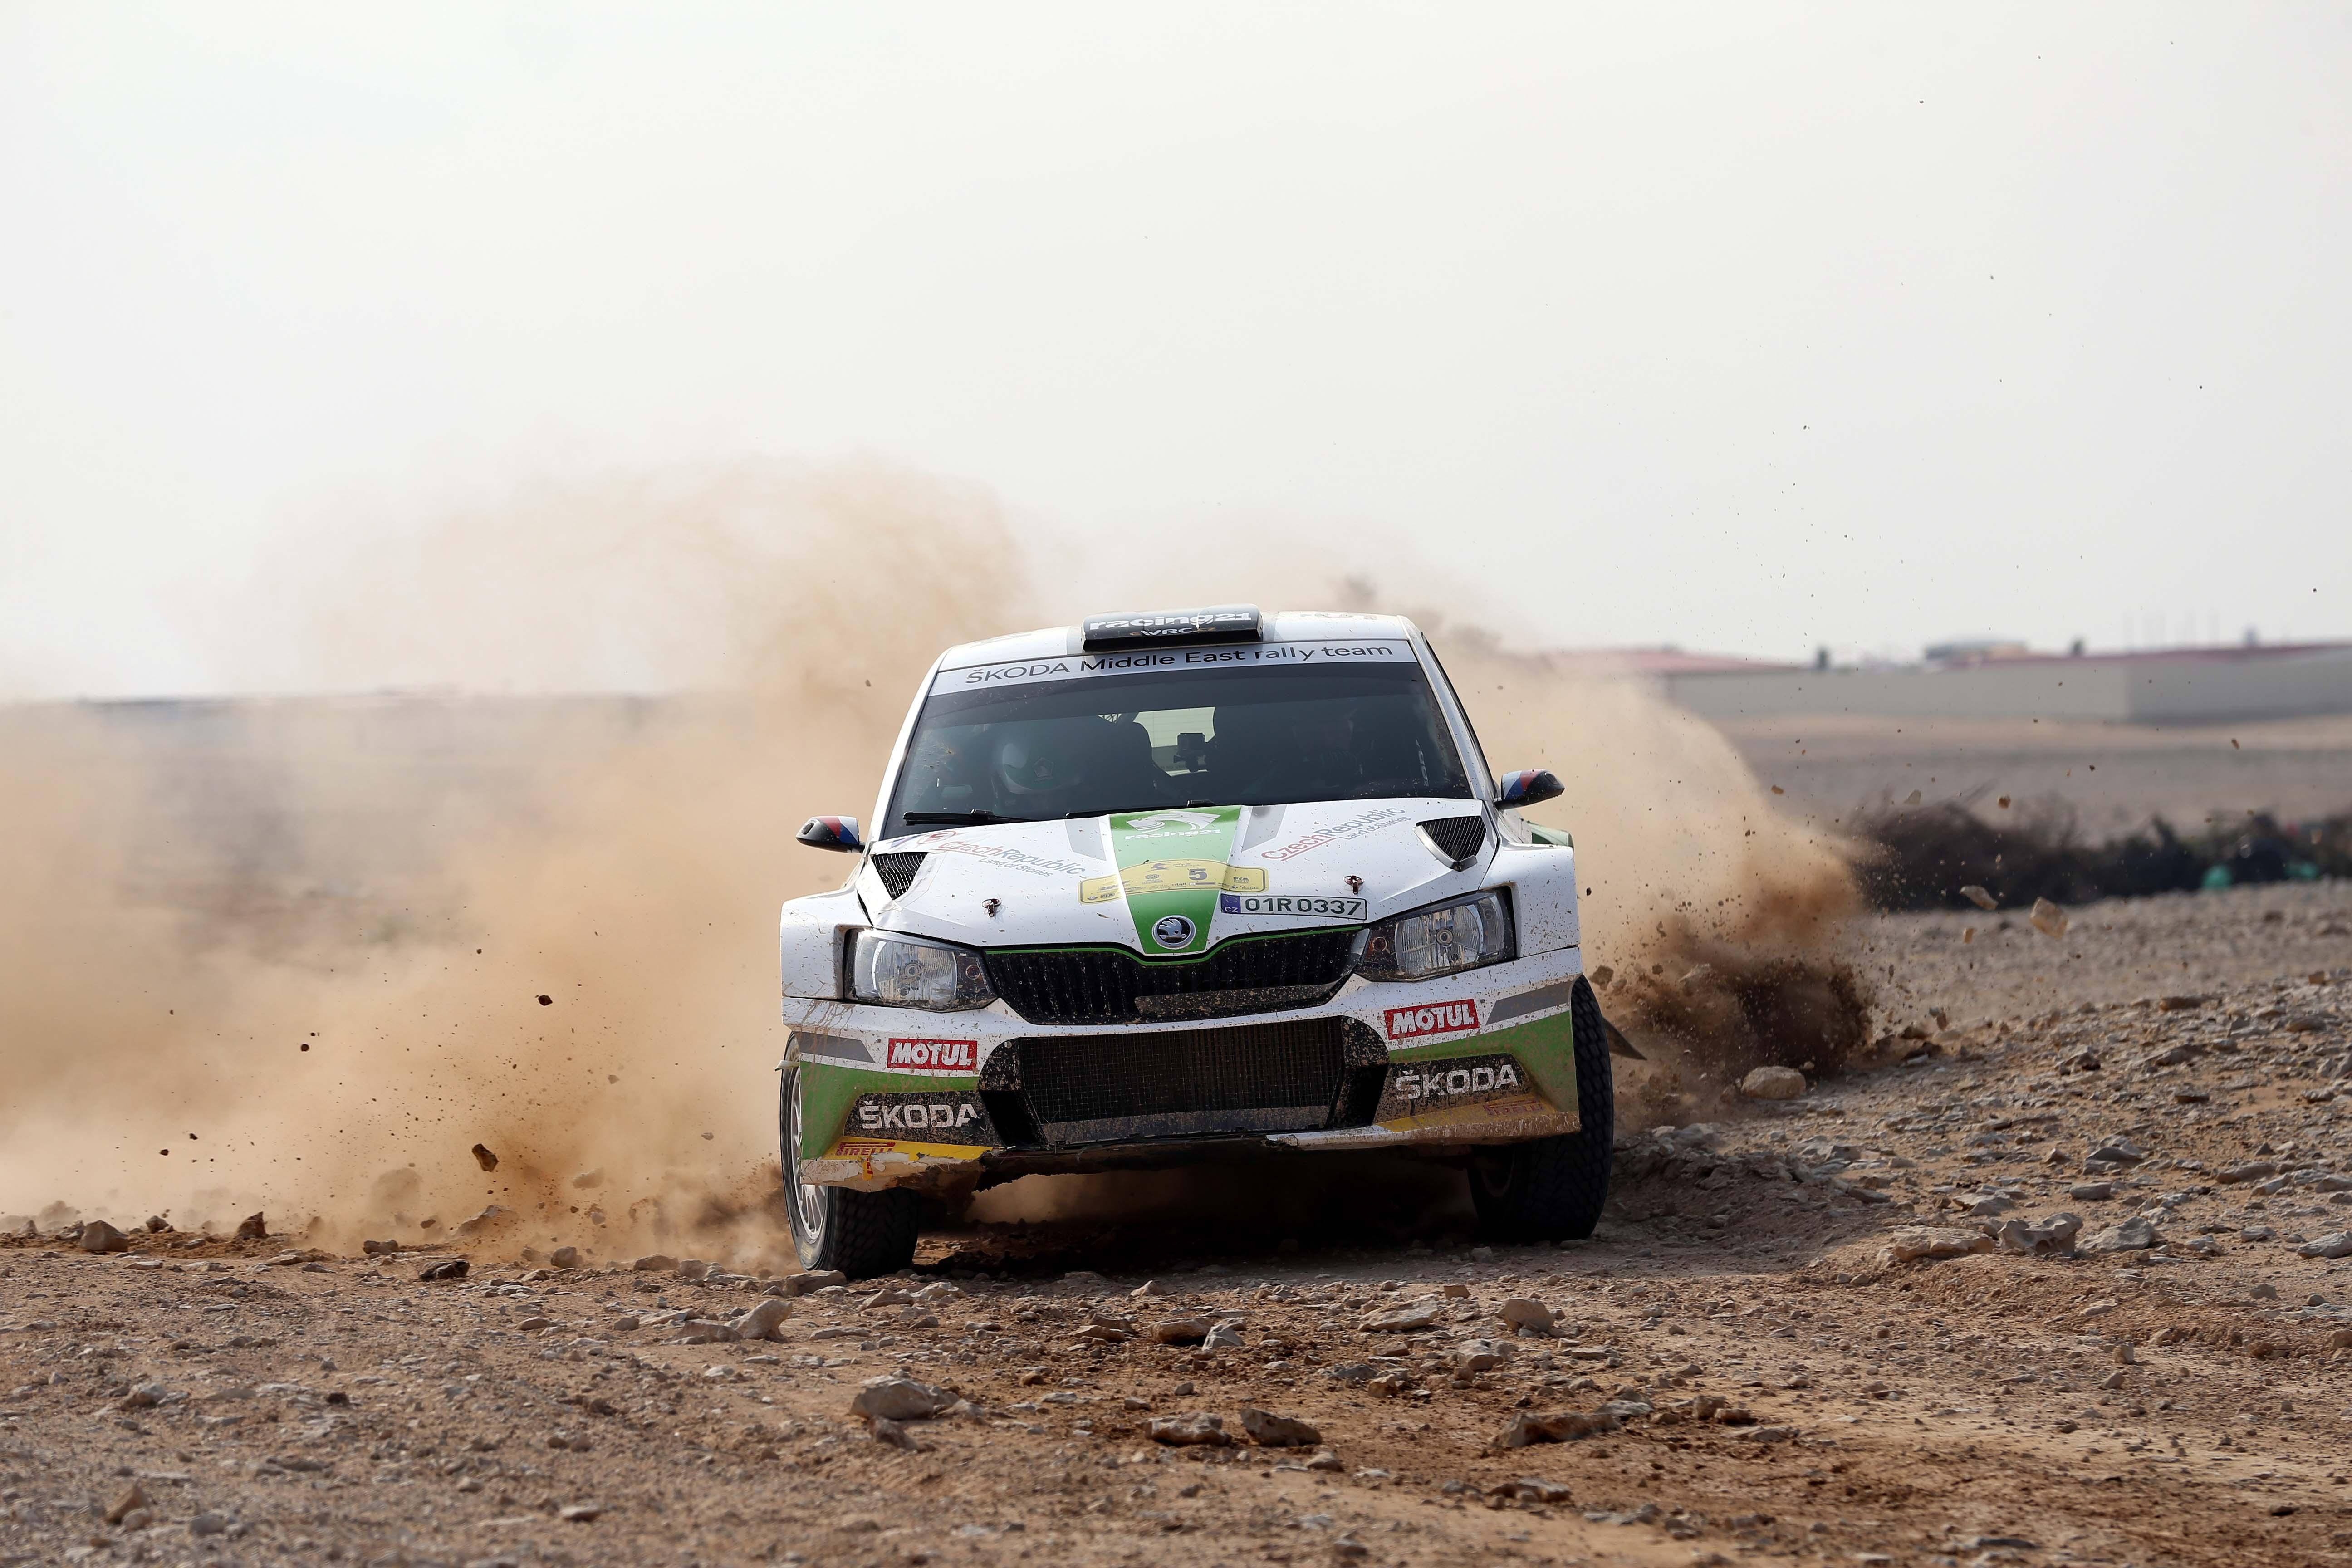 MERC - Vojtĕch Štajf becomes first non-Arab winner of Manateq International Rally of Qatar since 1986